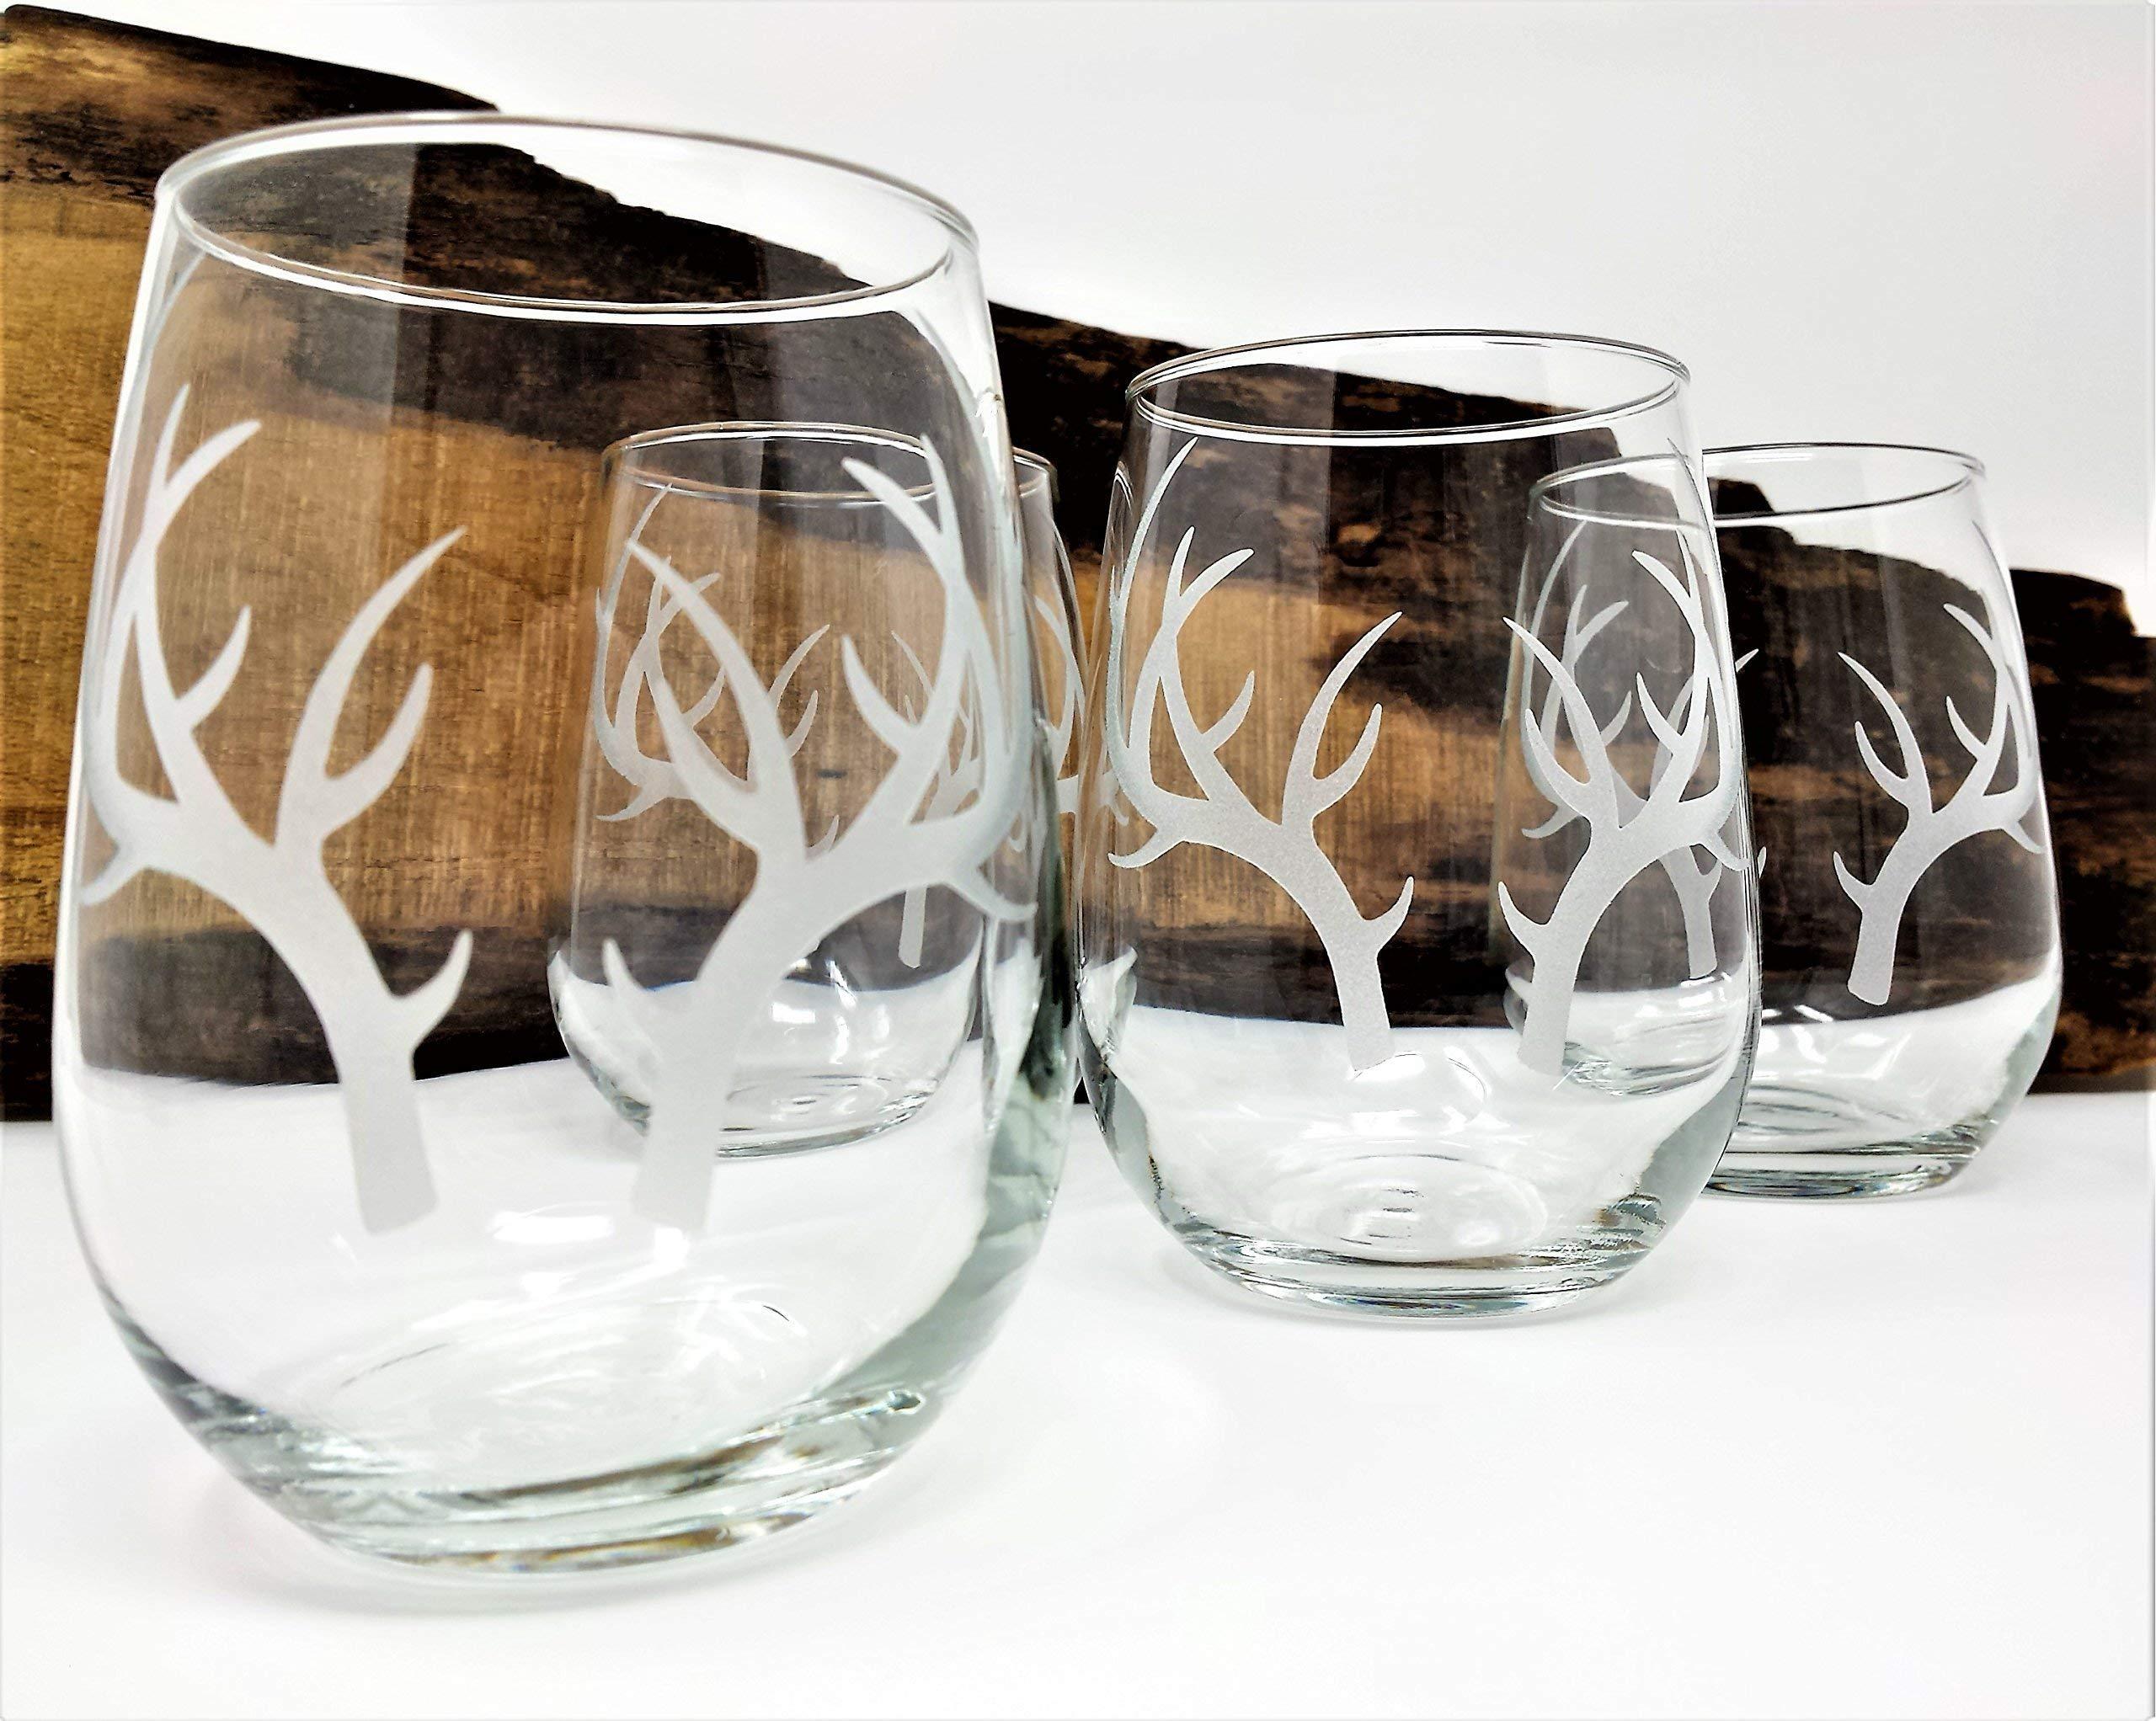 Antlers Stemless Wine Glasses Engraved Wedding Favors Cottage Barware